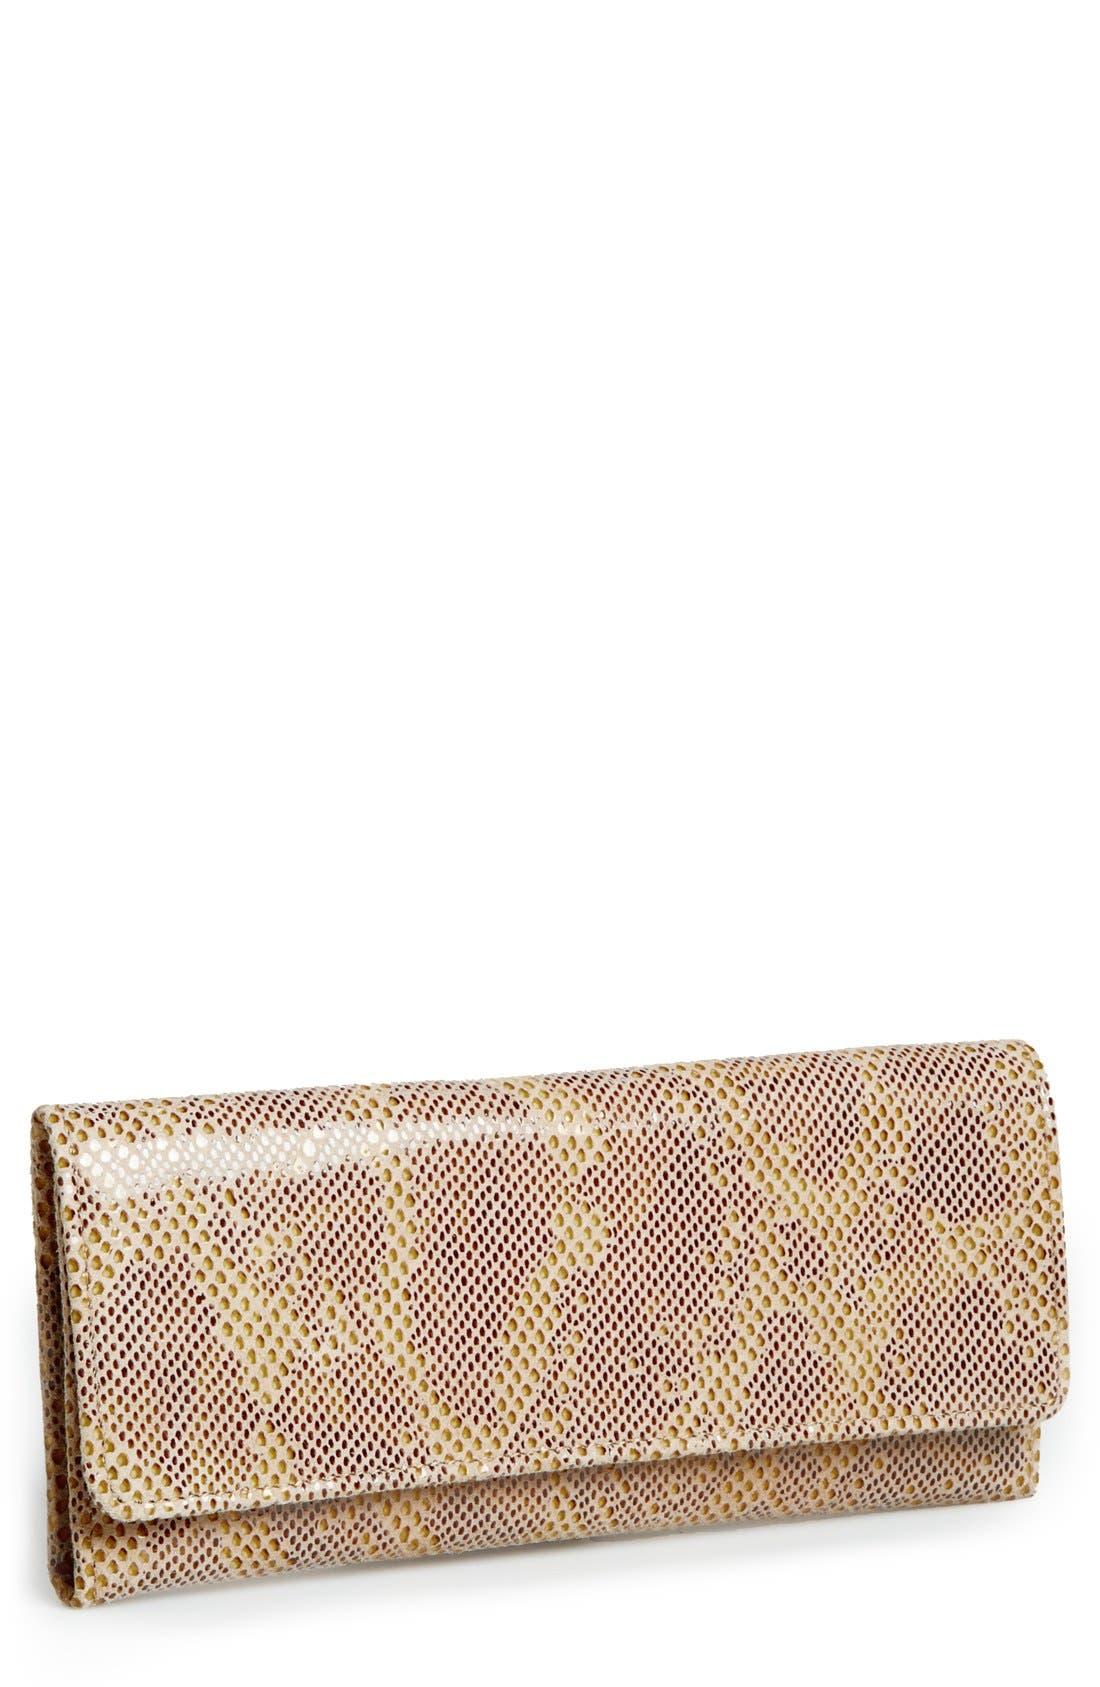 'Sadie' Leather Wallet,                             Main thumbnail 34, color,